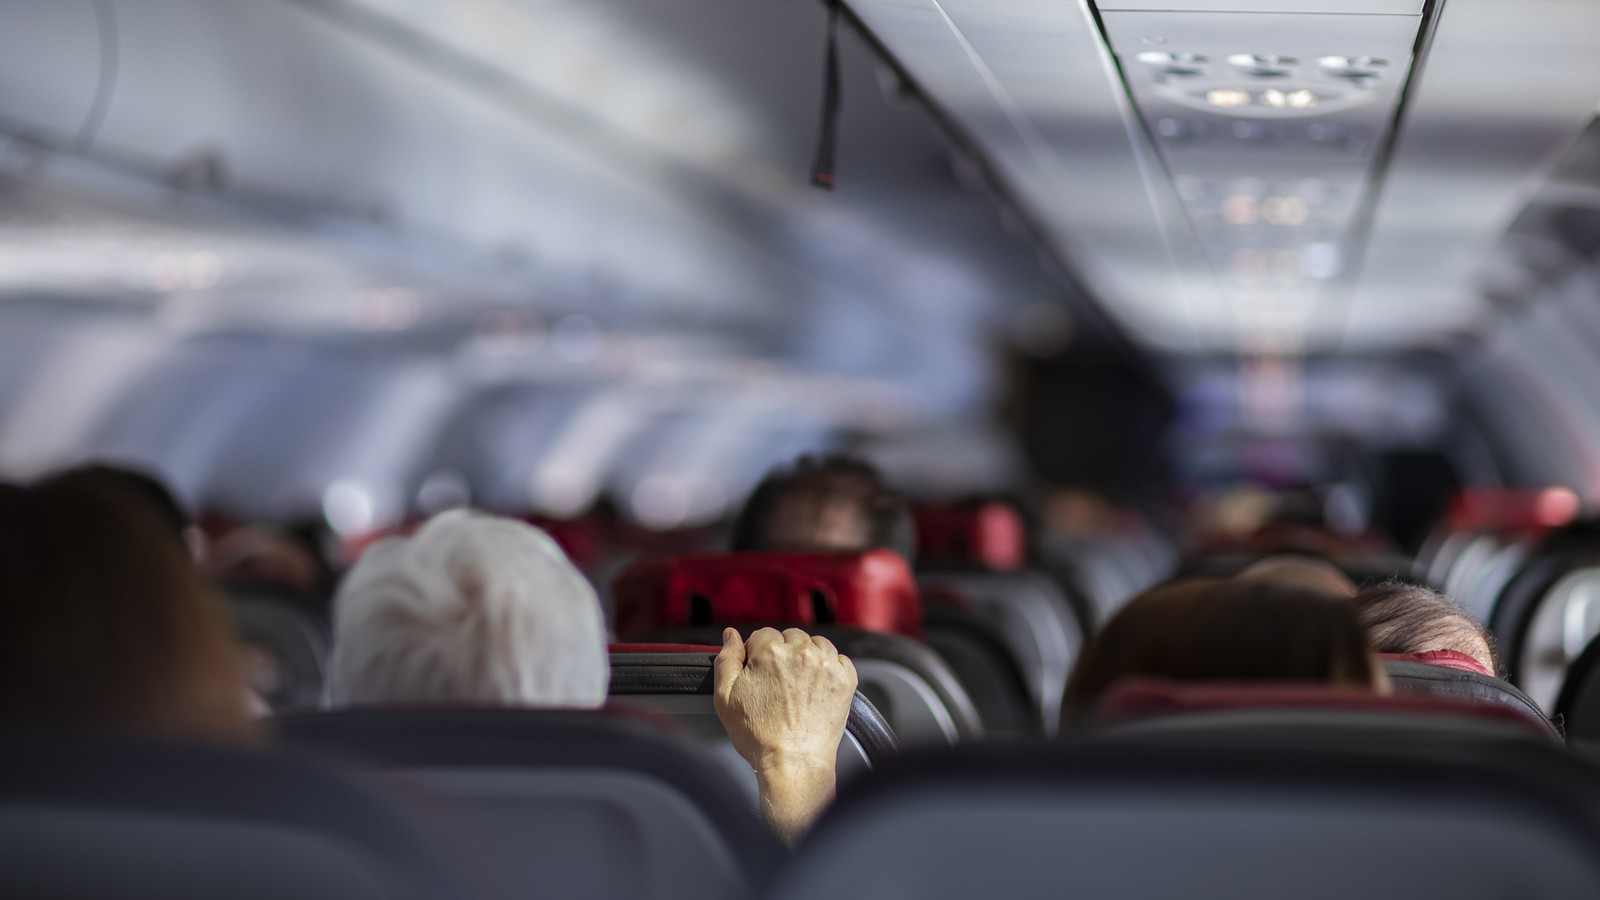 Kabine im Flugzeug